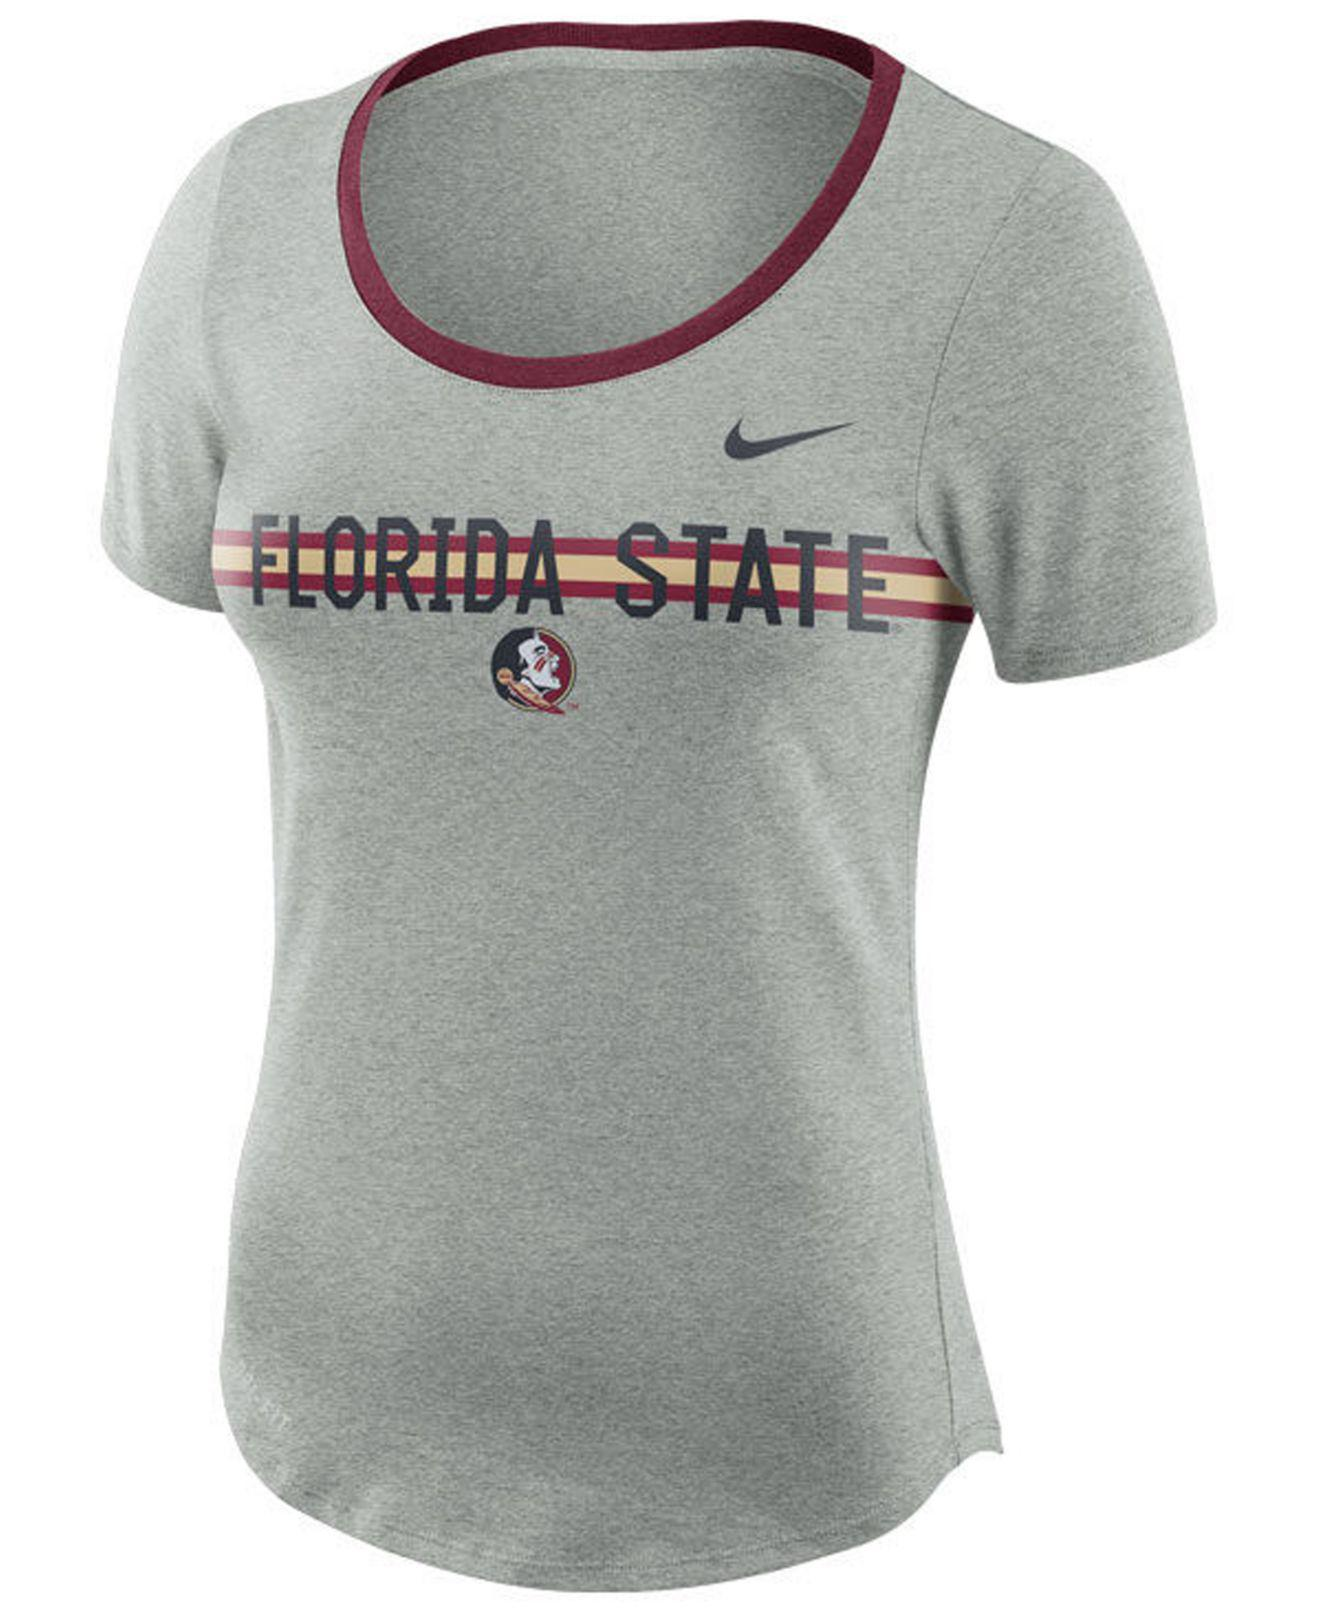 Lyst - Nike Women s Tri Blend Slub T-shirt in Gray 23e90cc82